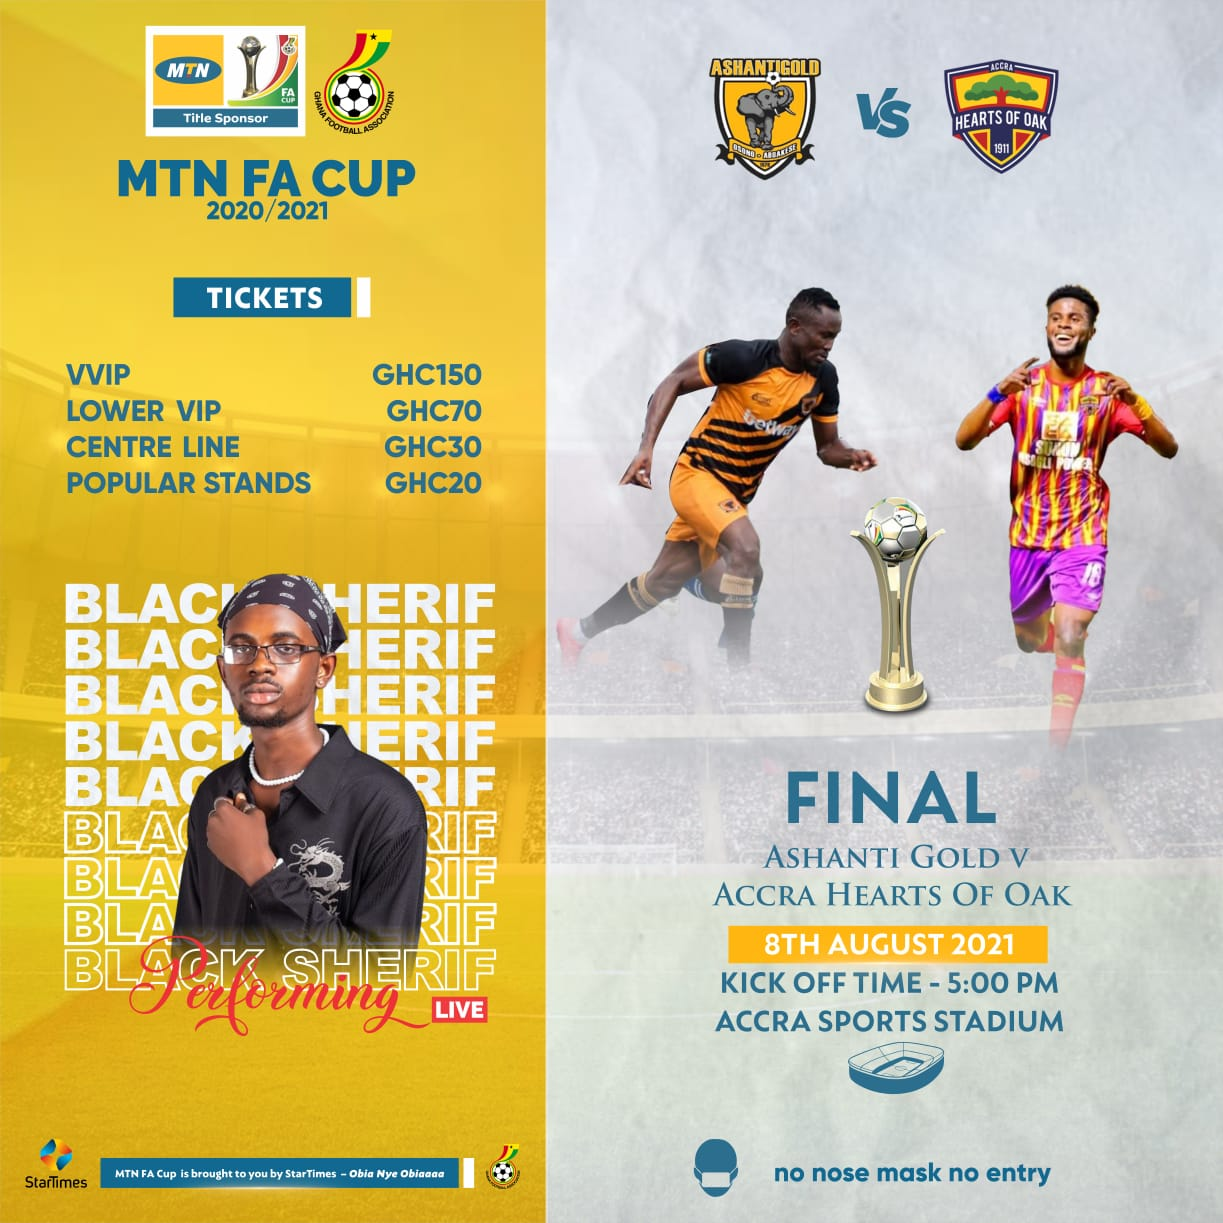 MTN FA Cup final: Tickets on-sale via MTN E-ticketing platform